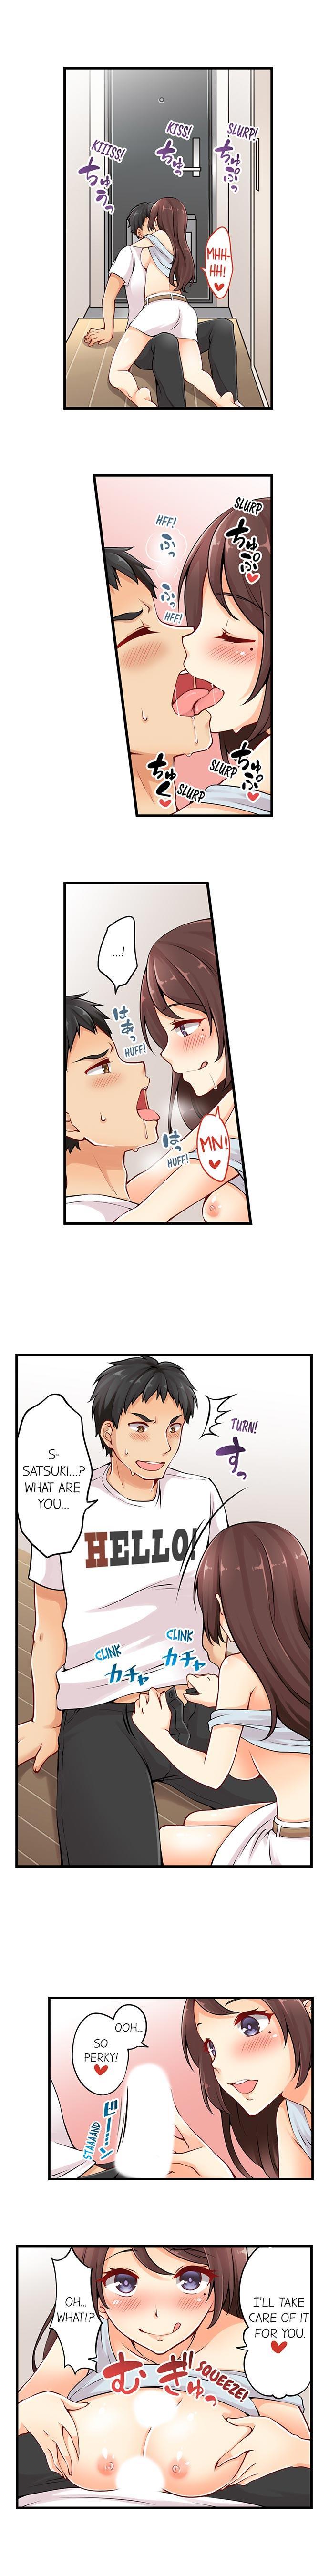 Ren Arisugawa Is Actually A Girl 56